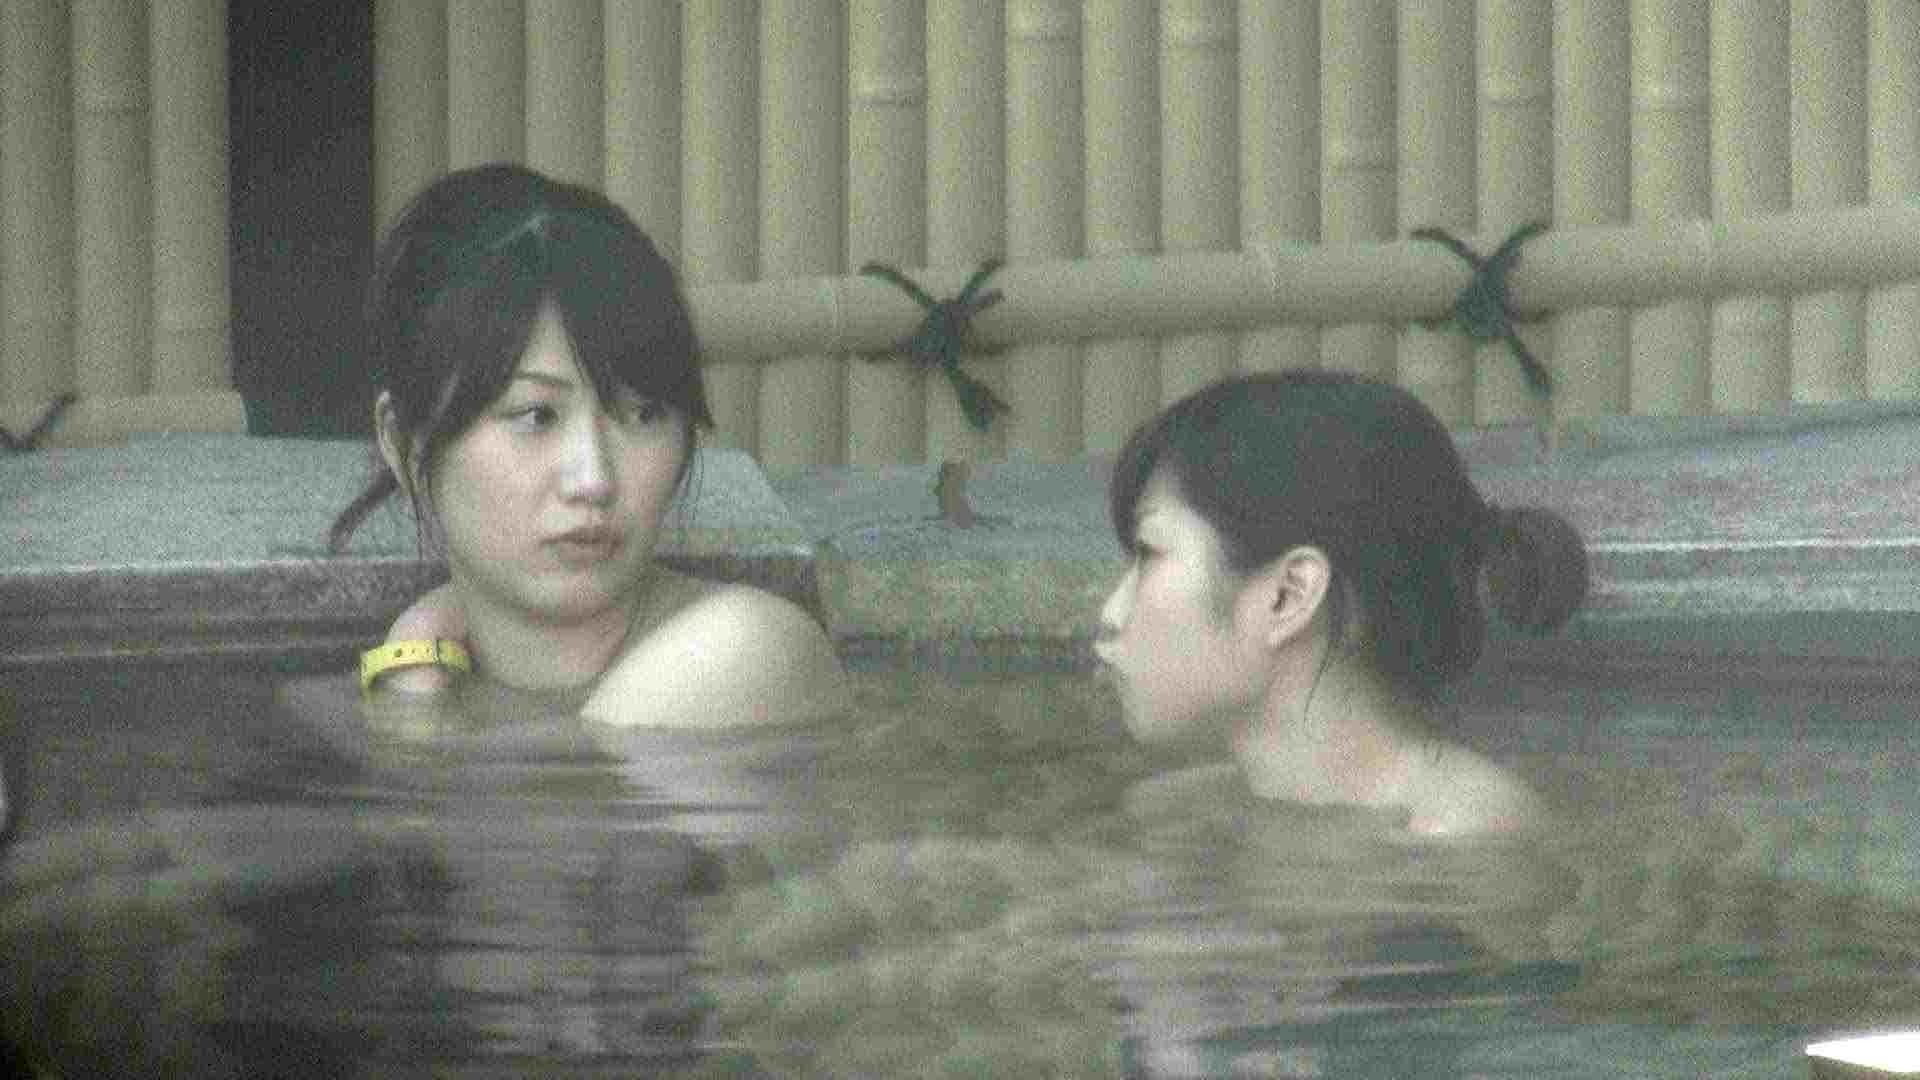 Aquaな露天風呂Vol.206 露天 | HなOL  74pic 3